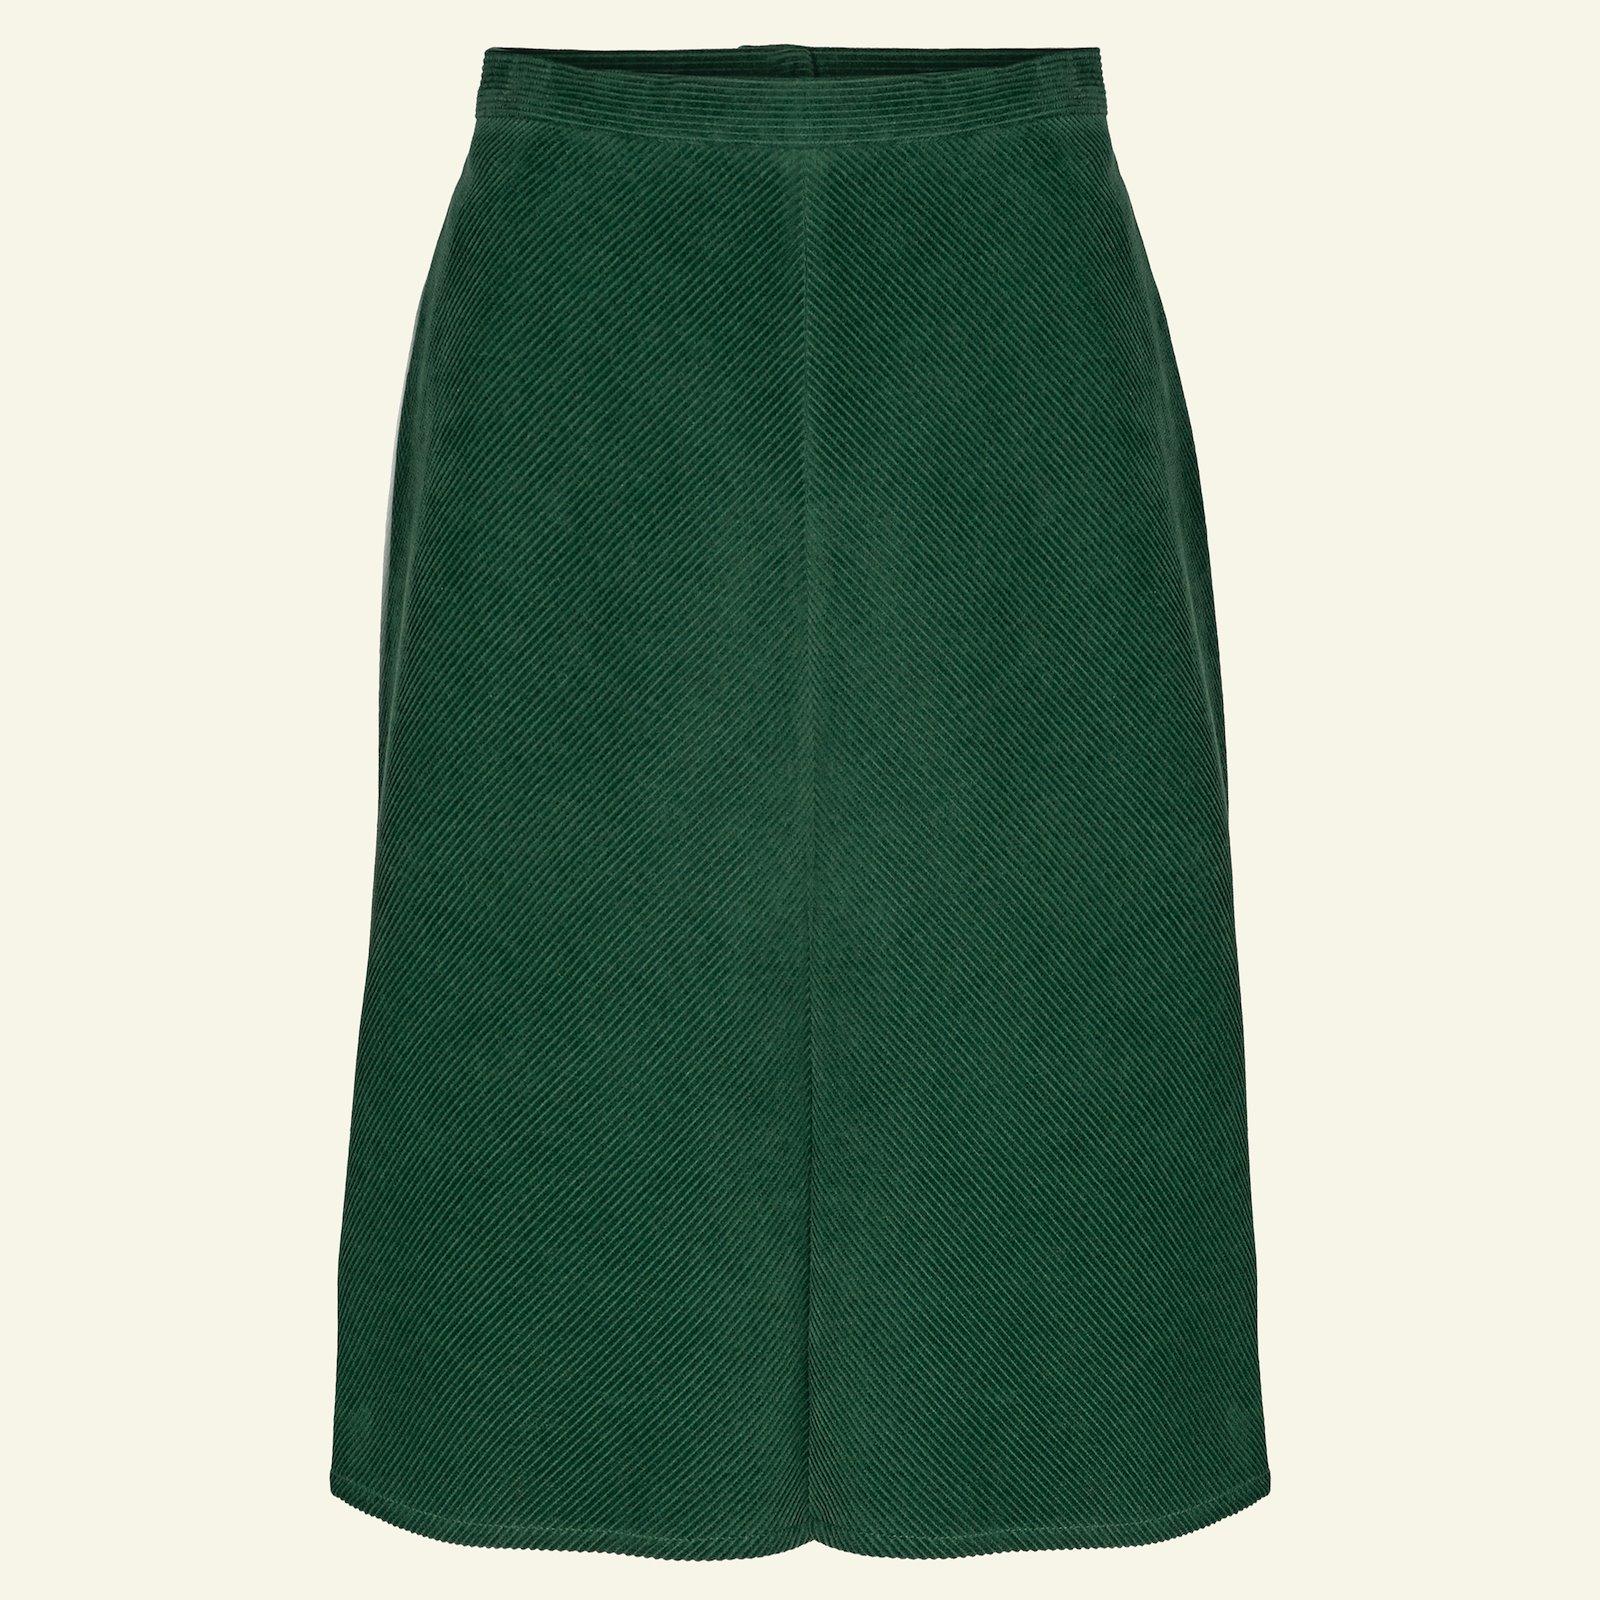 Skirt with A-shape, 38/10 p21038_430819_sskit